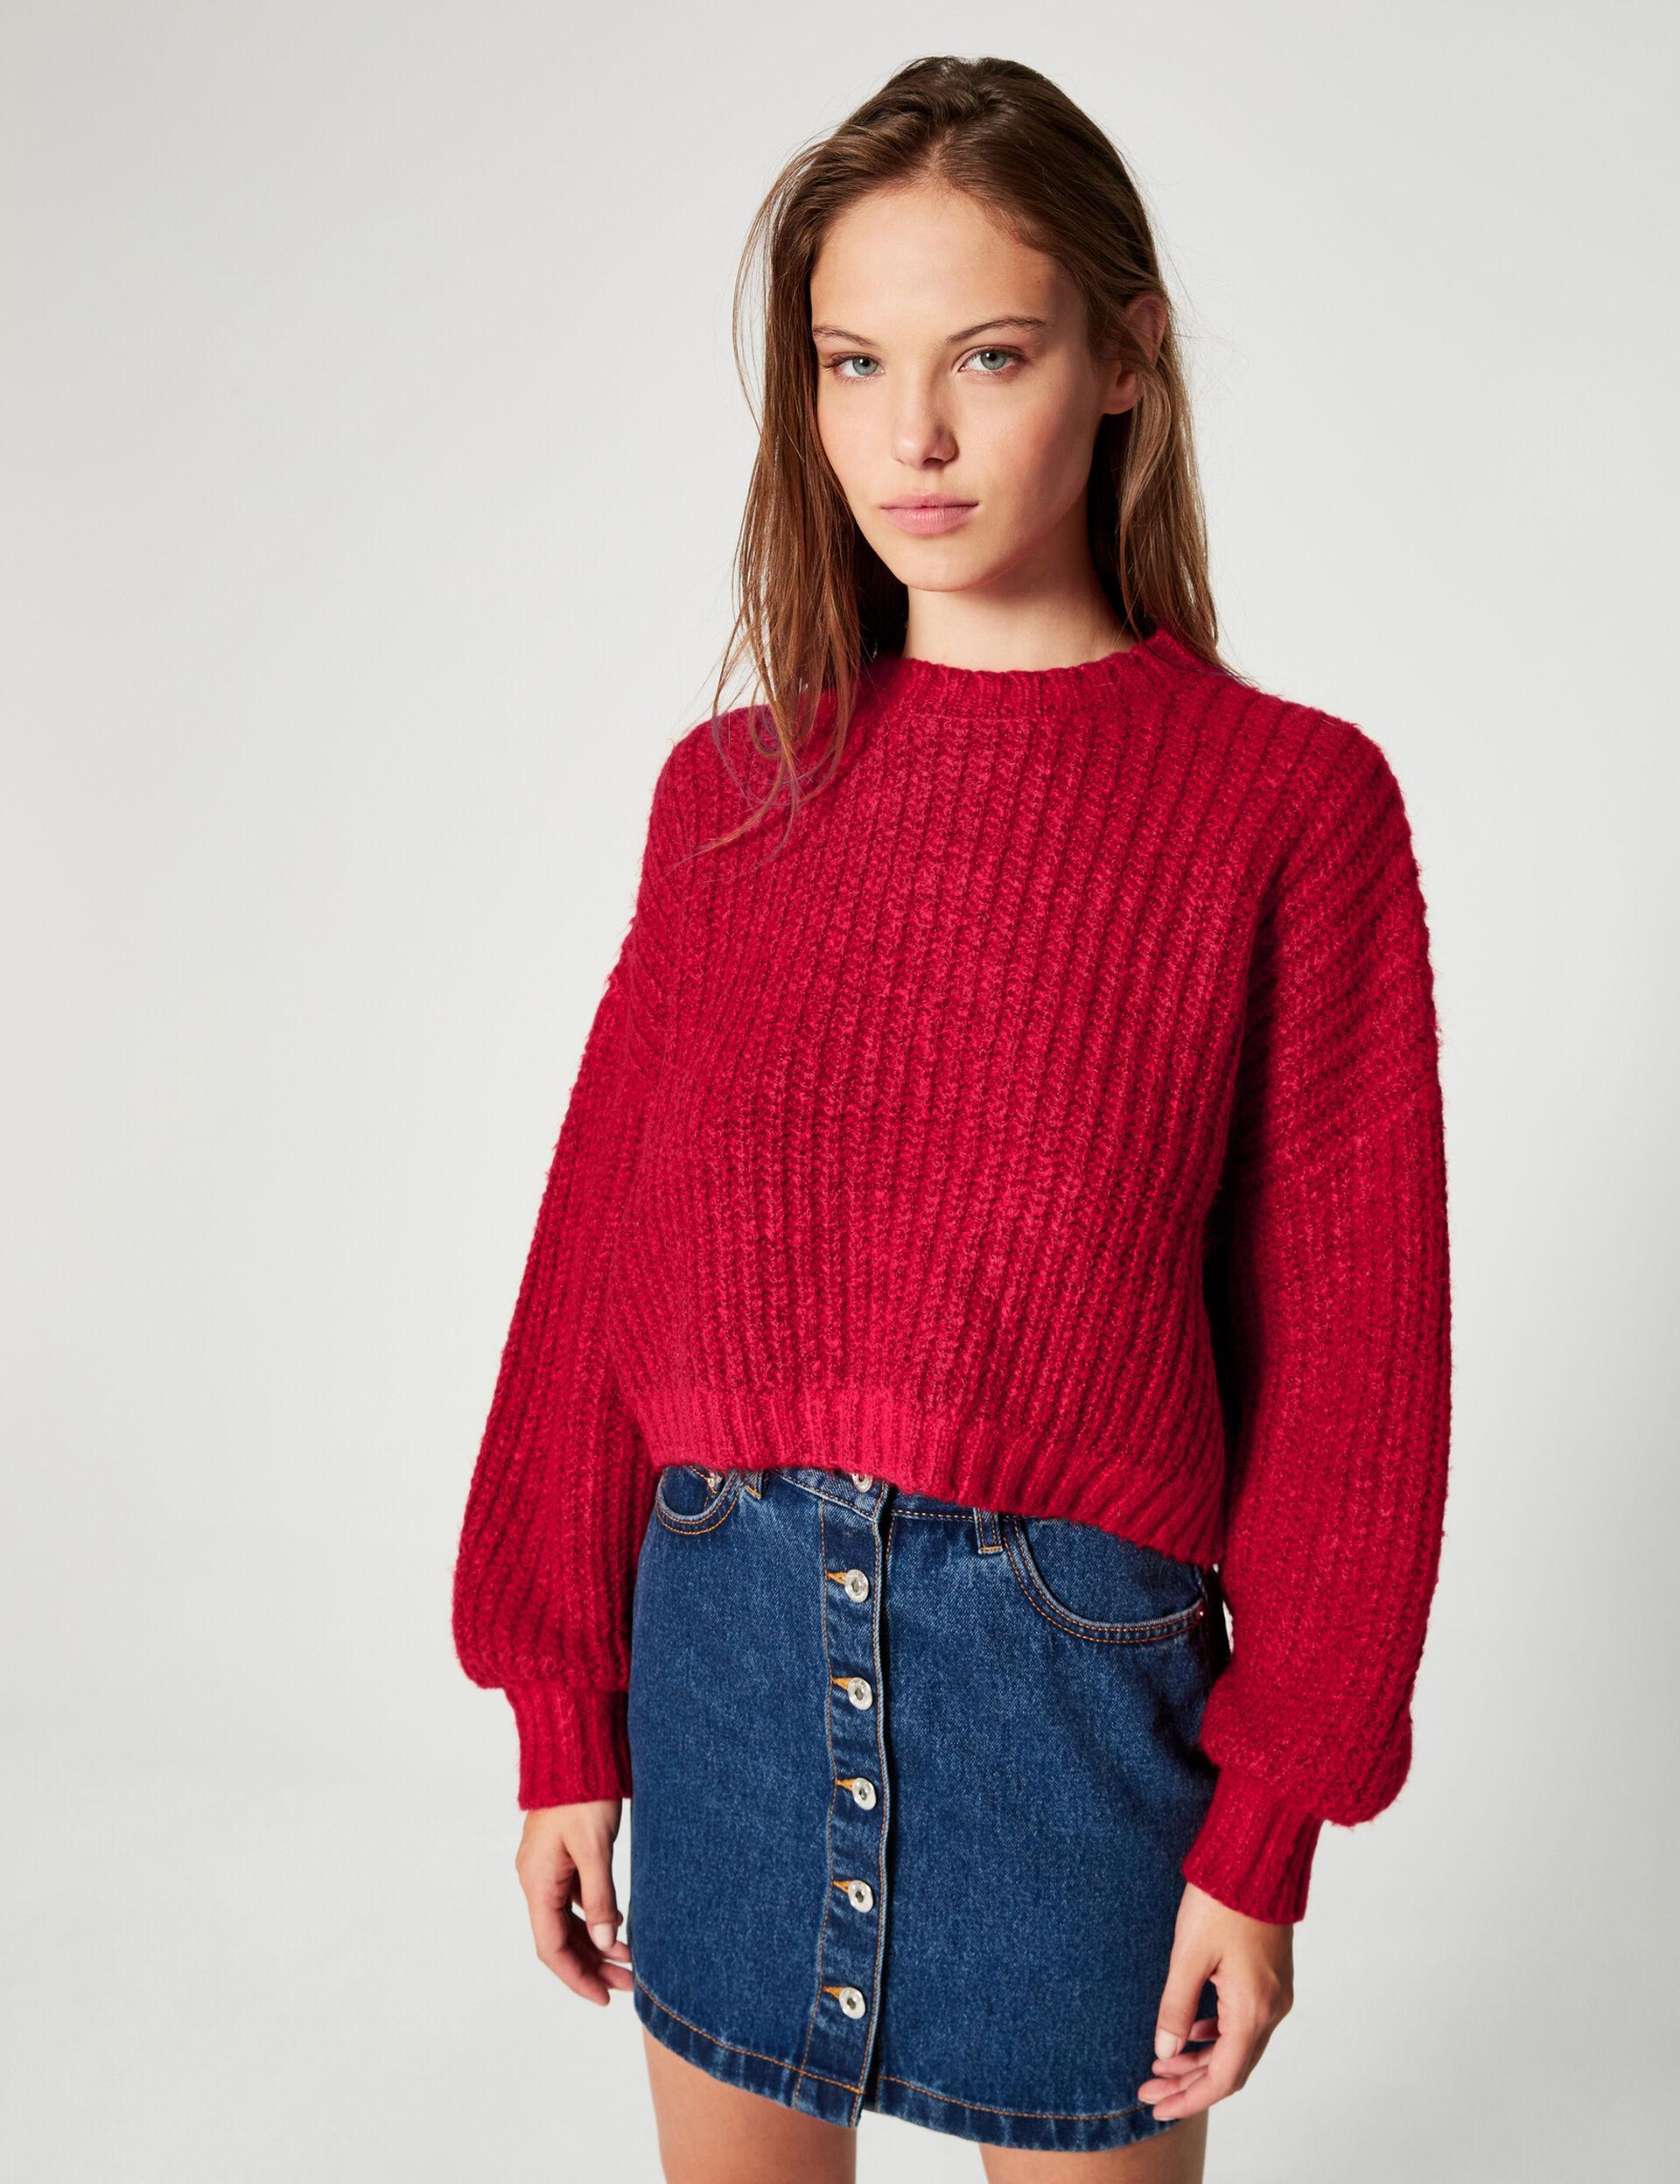 Oversized cropped jumper